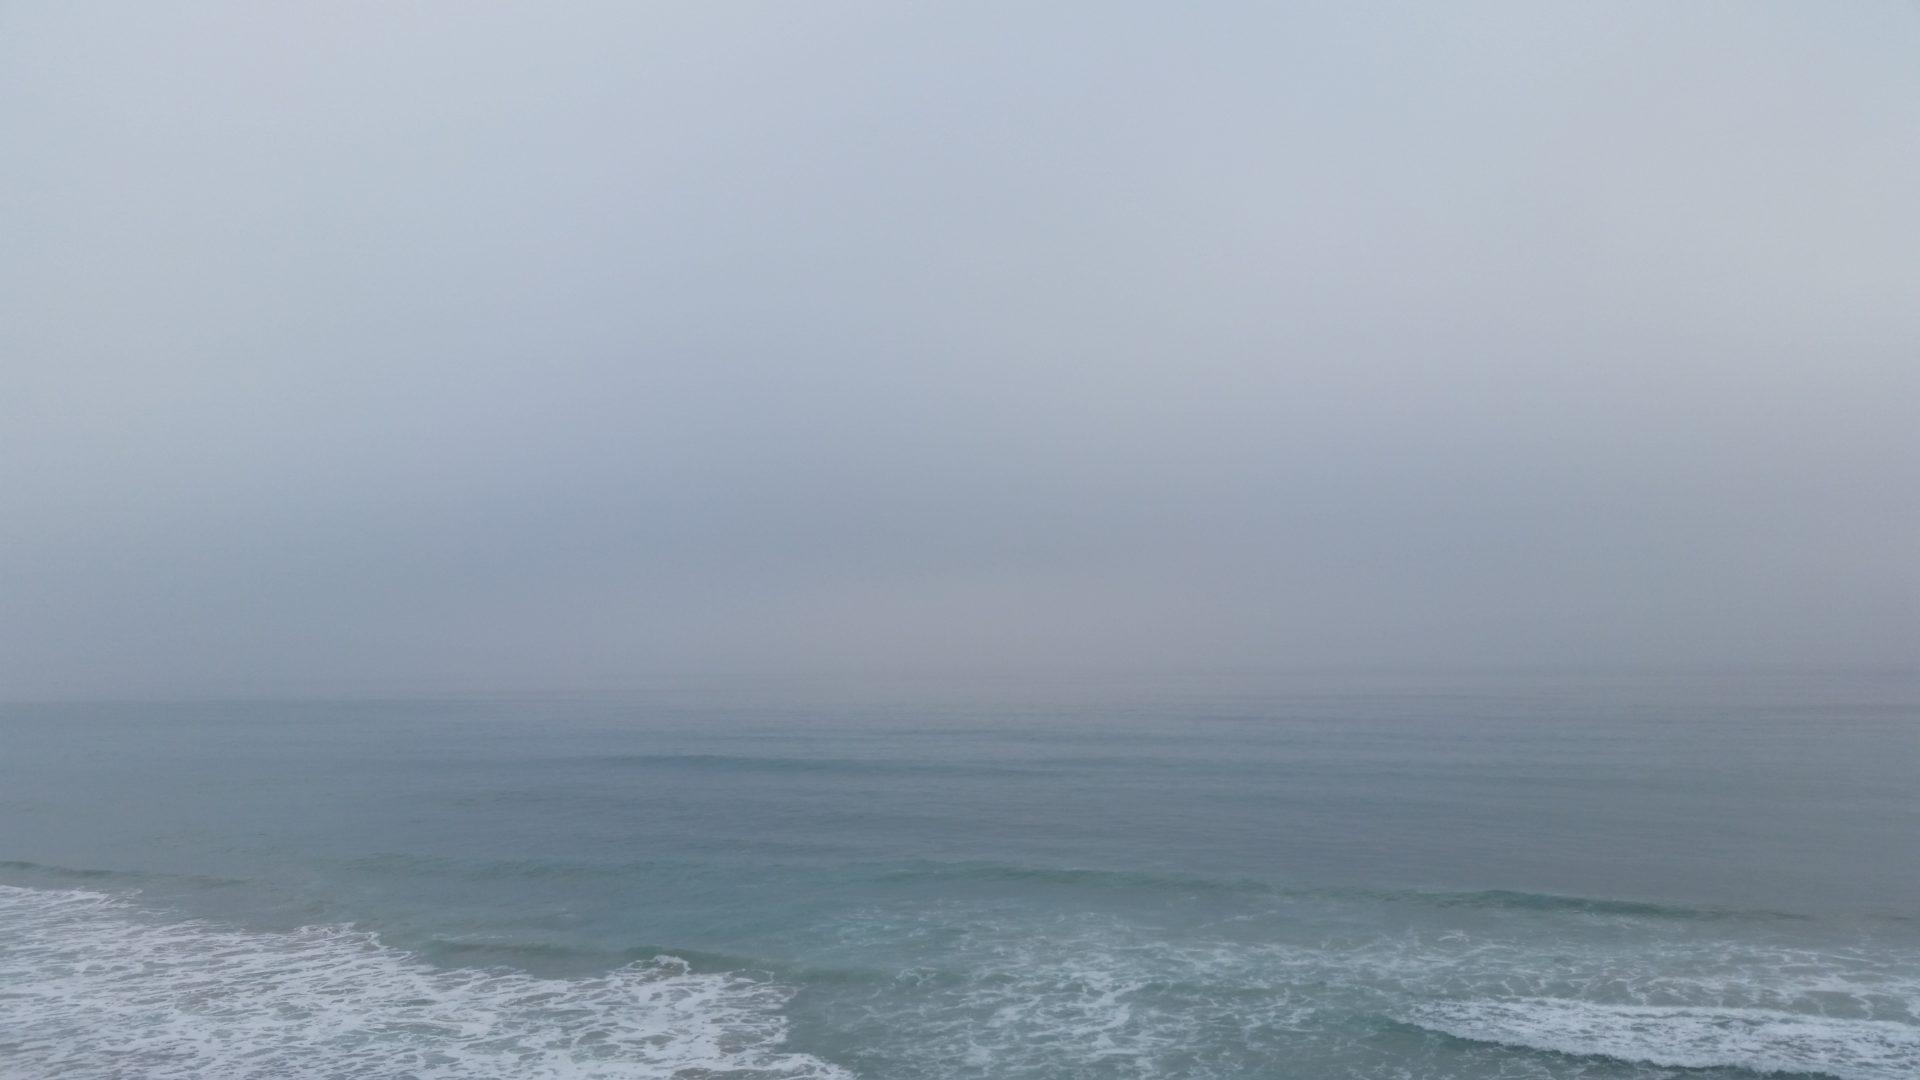 Afternoon Haze